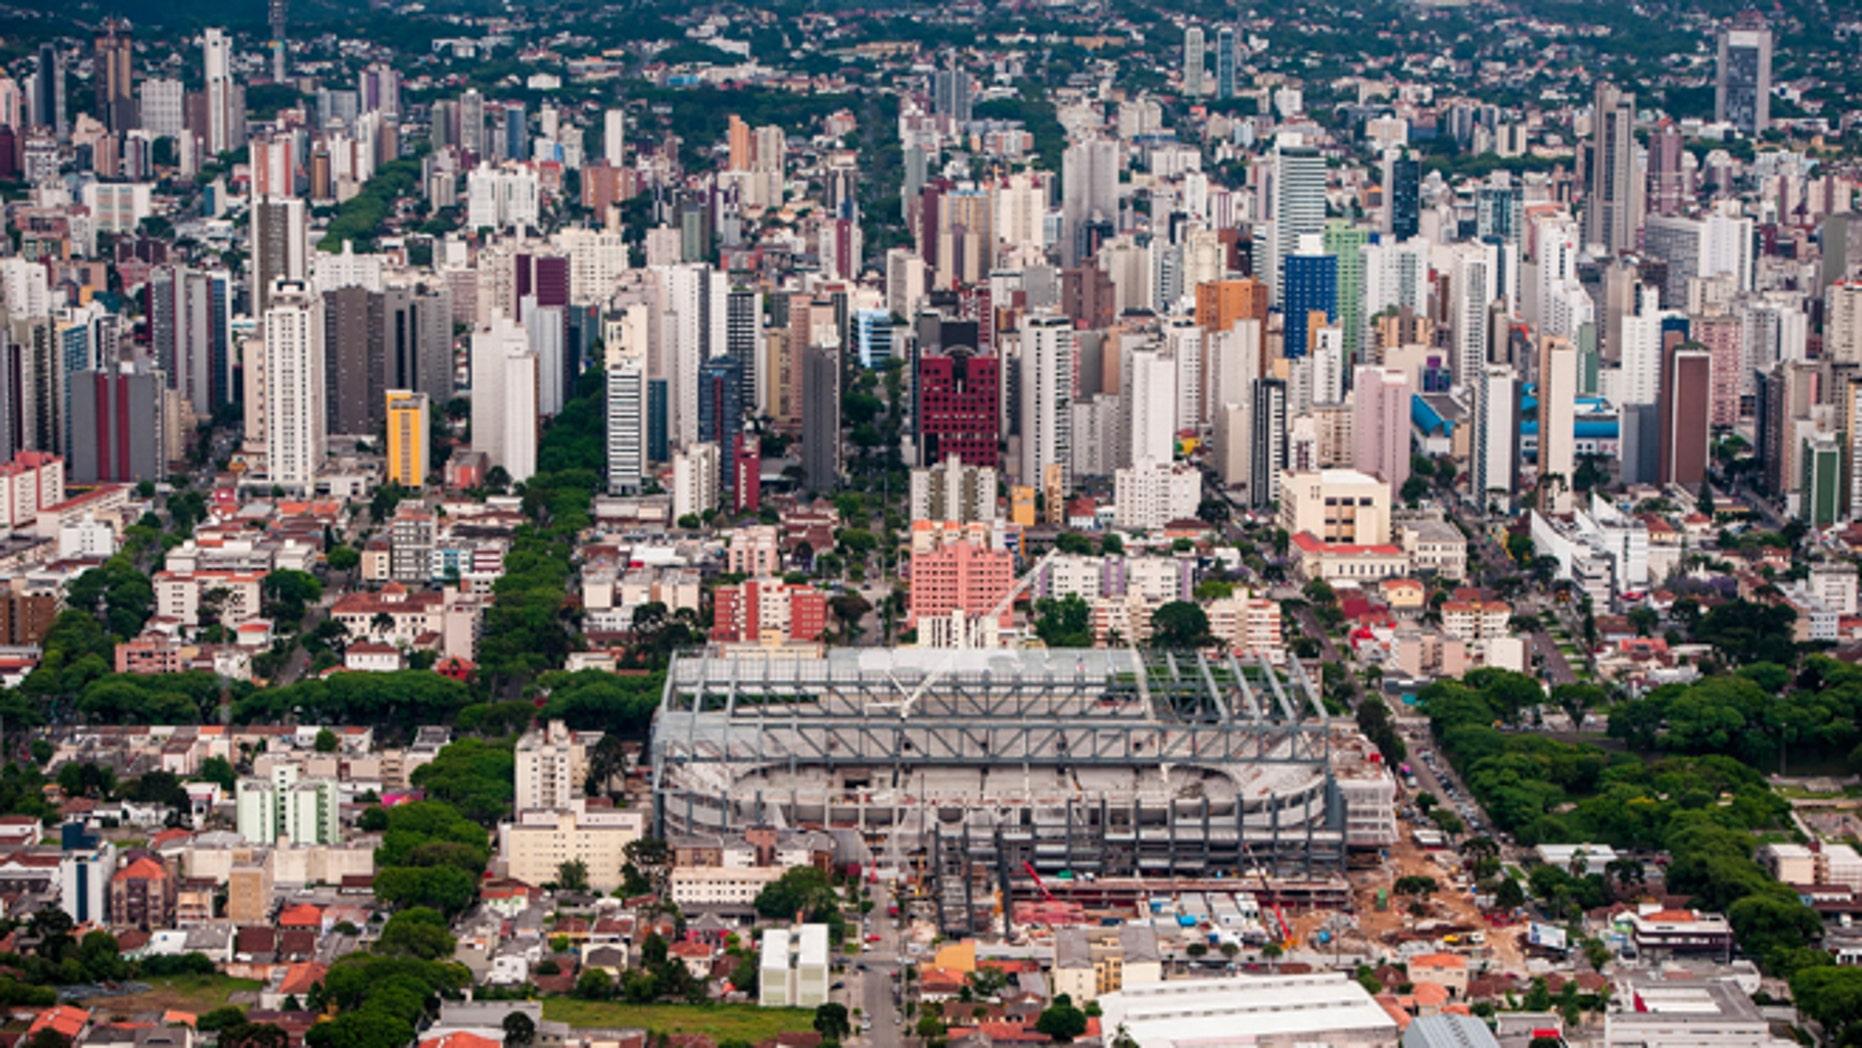 Aerial view of the Arena da Baixada stadium undergoing remodeling on November 22, 2013 in Curitiba, Brazil.